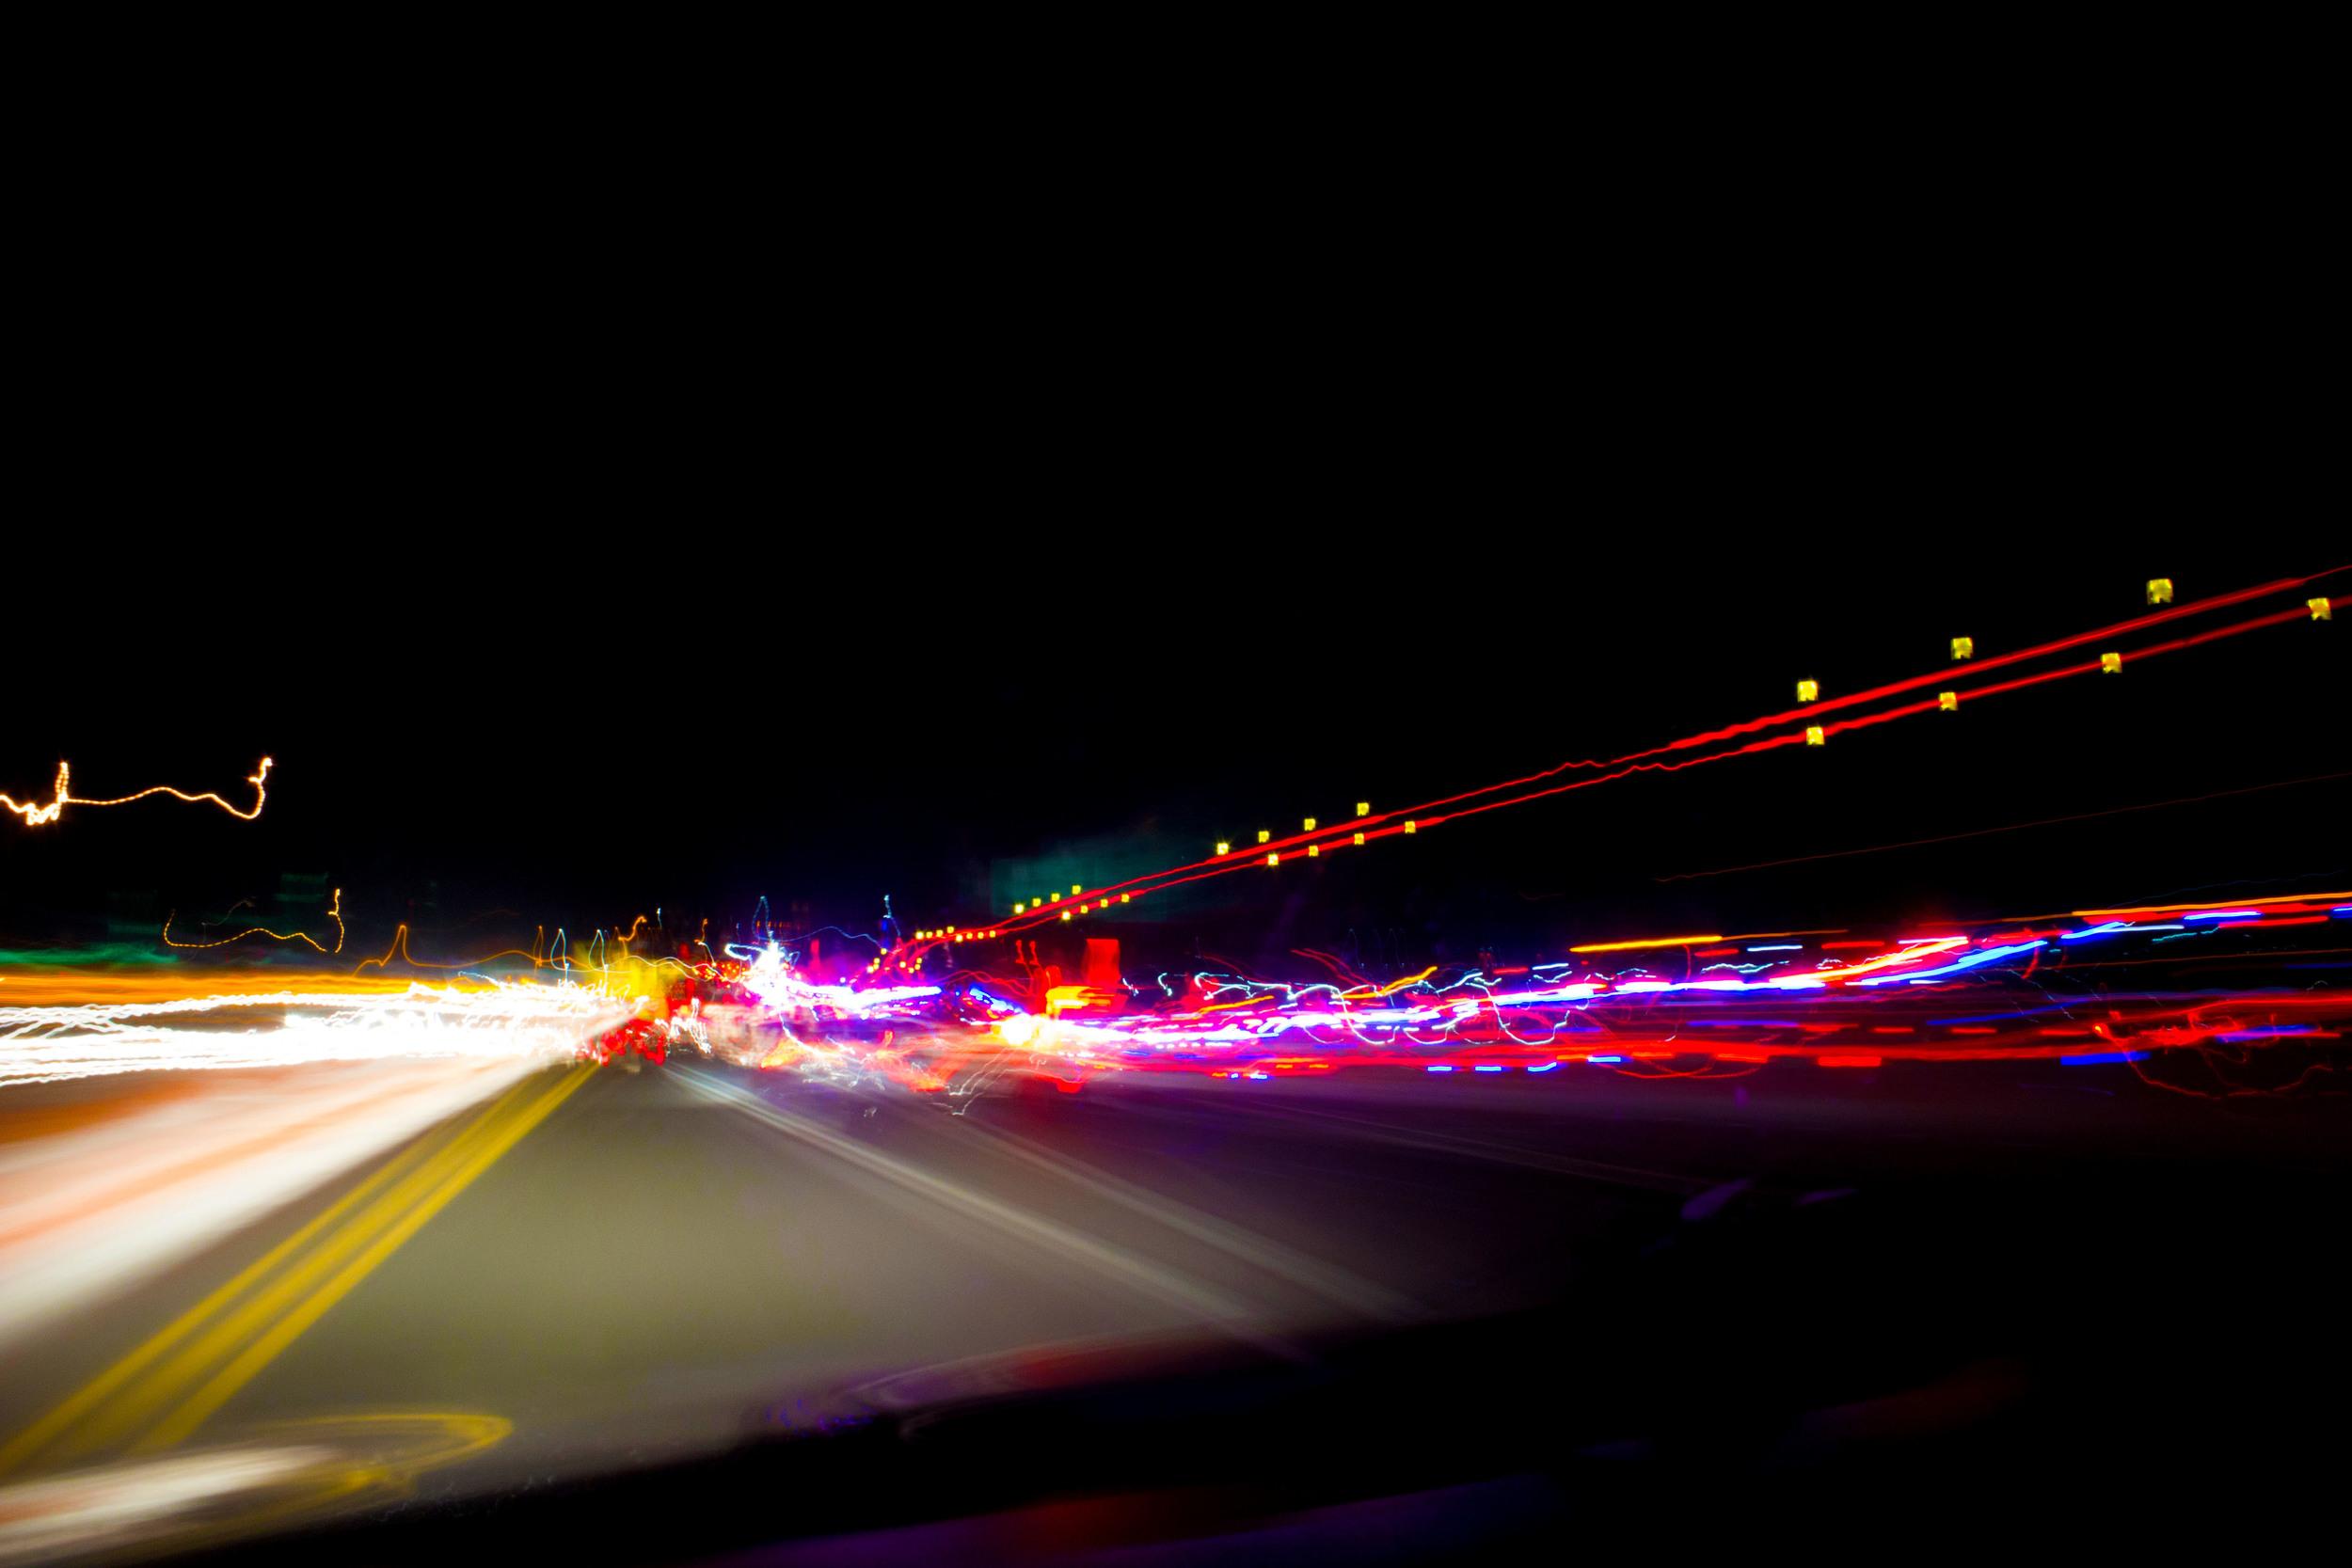 2013.05.03 - Light Driving (22 of 49) ADJUSTED.jpg